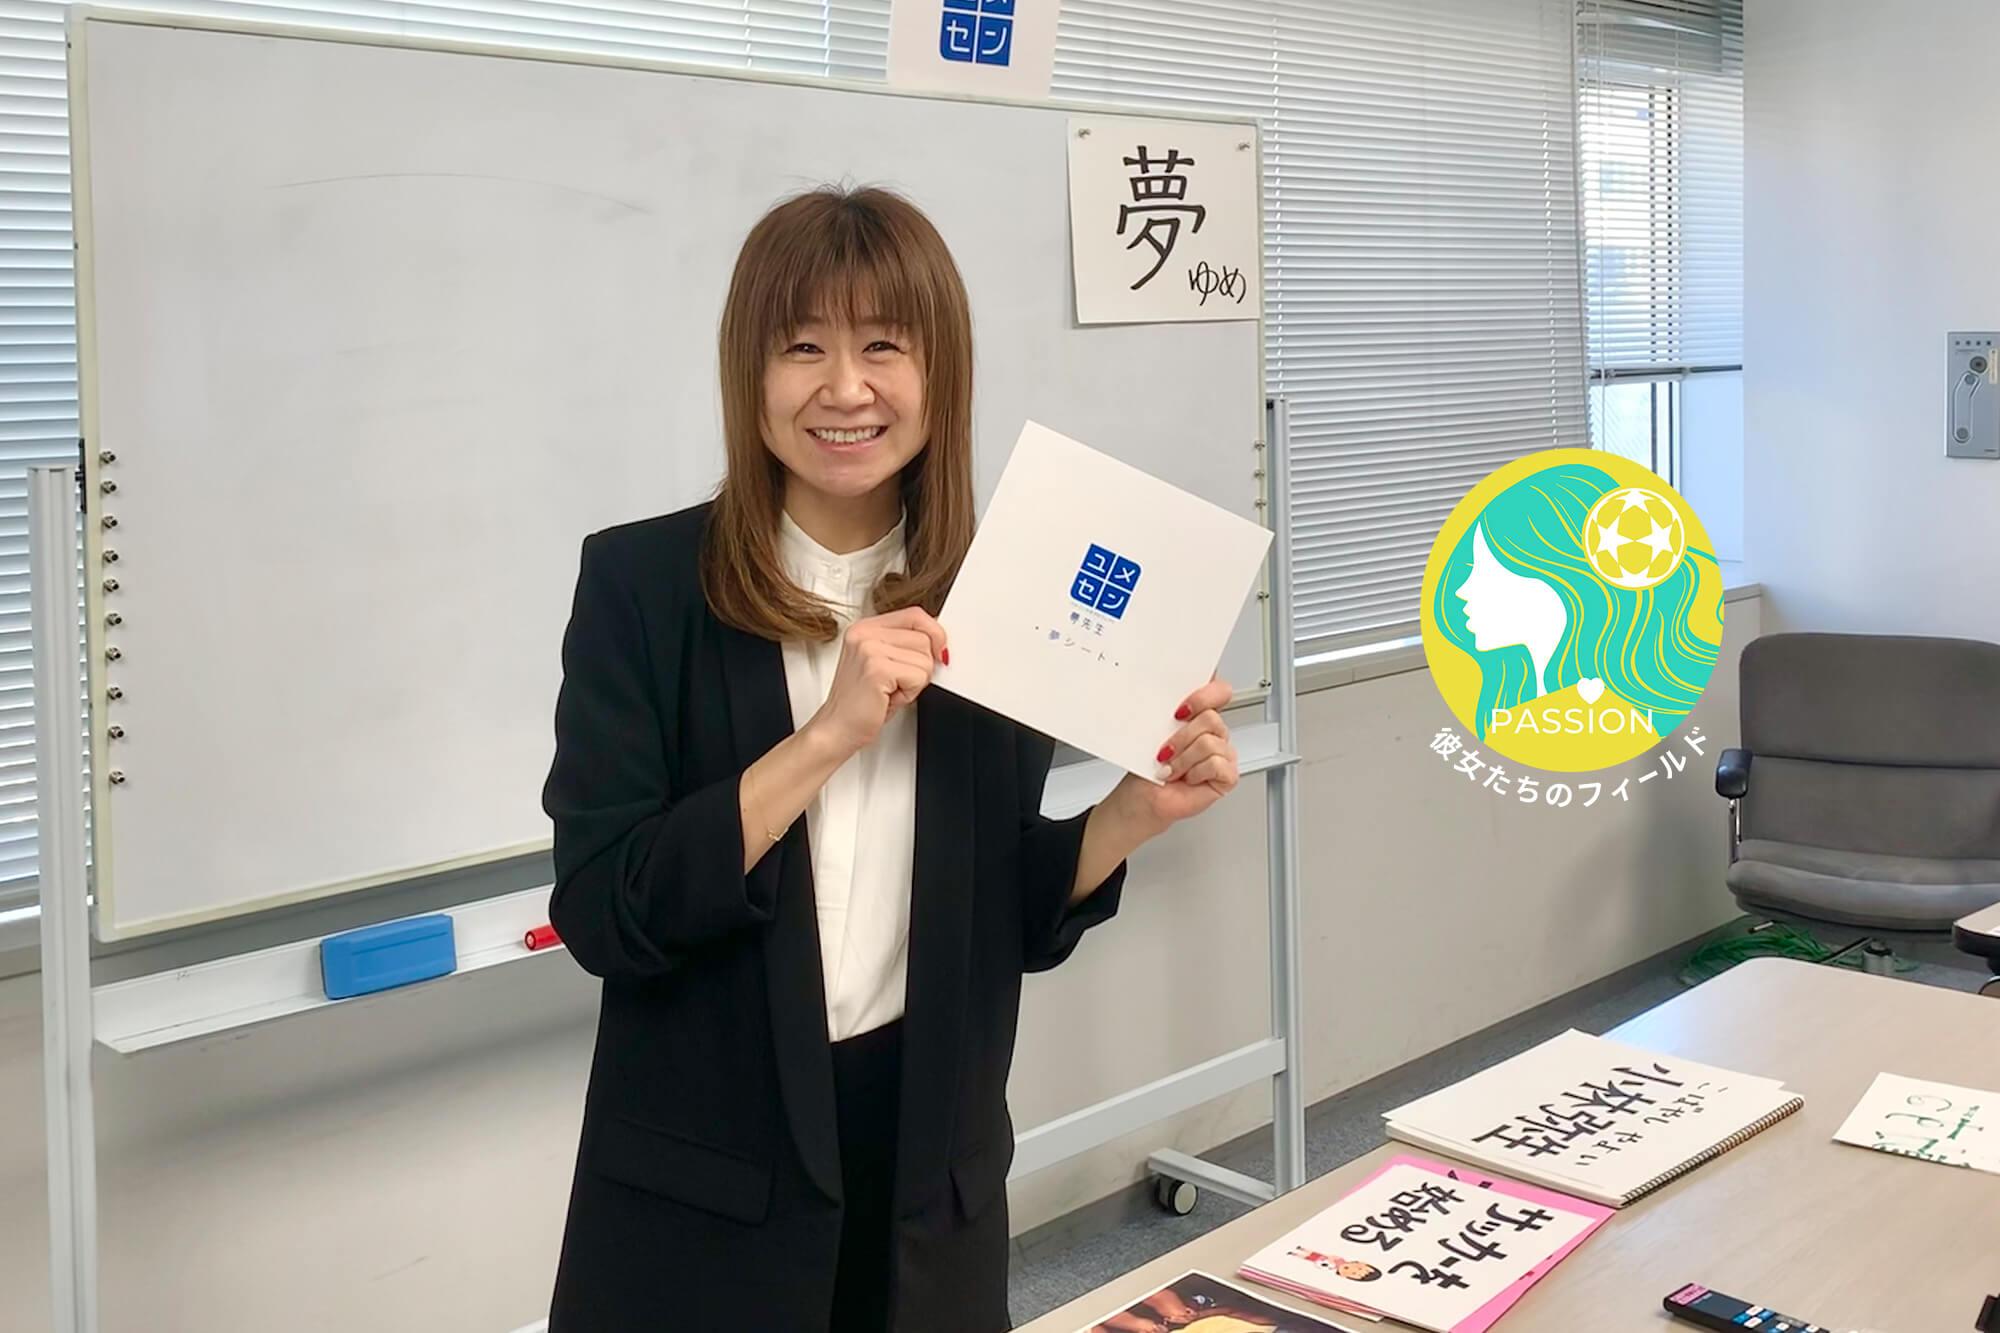 Vol.7 JFAこころのプロジェクト/小林弥生